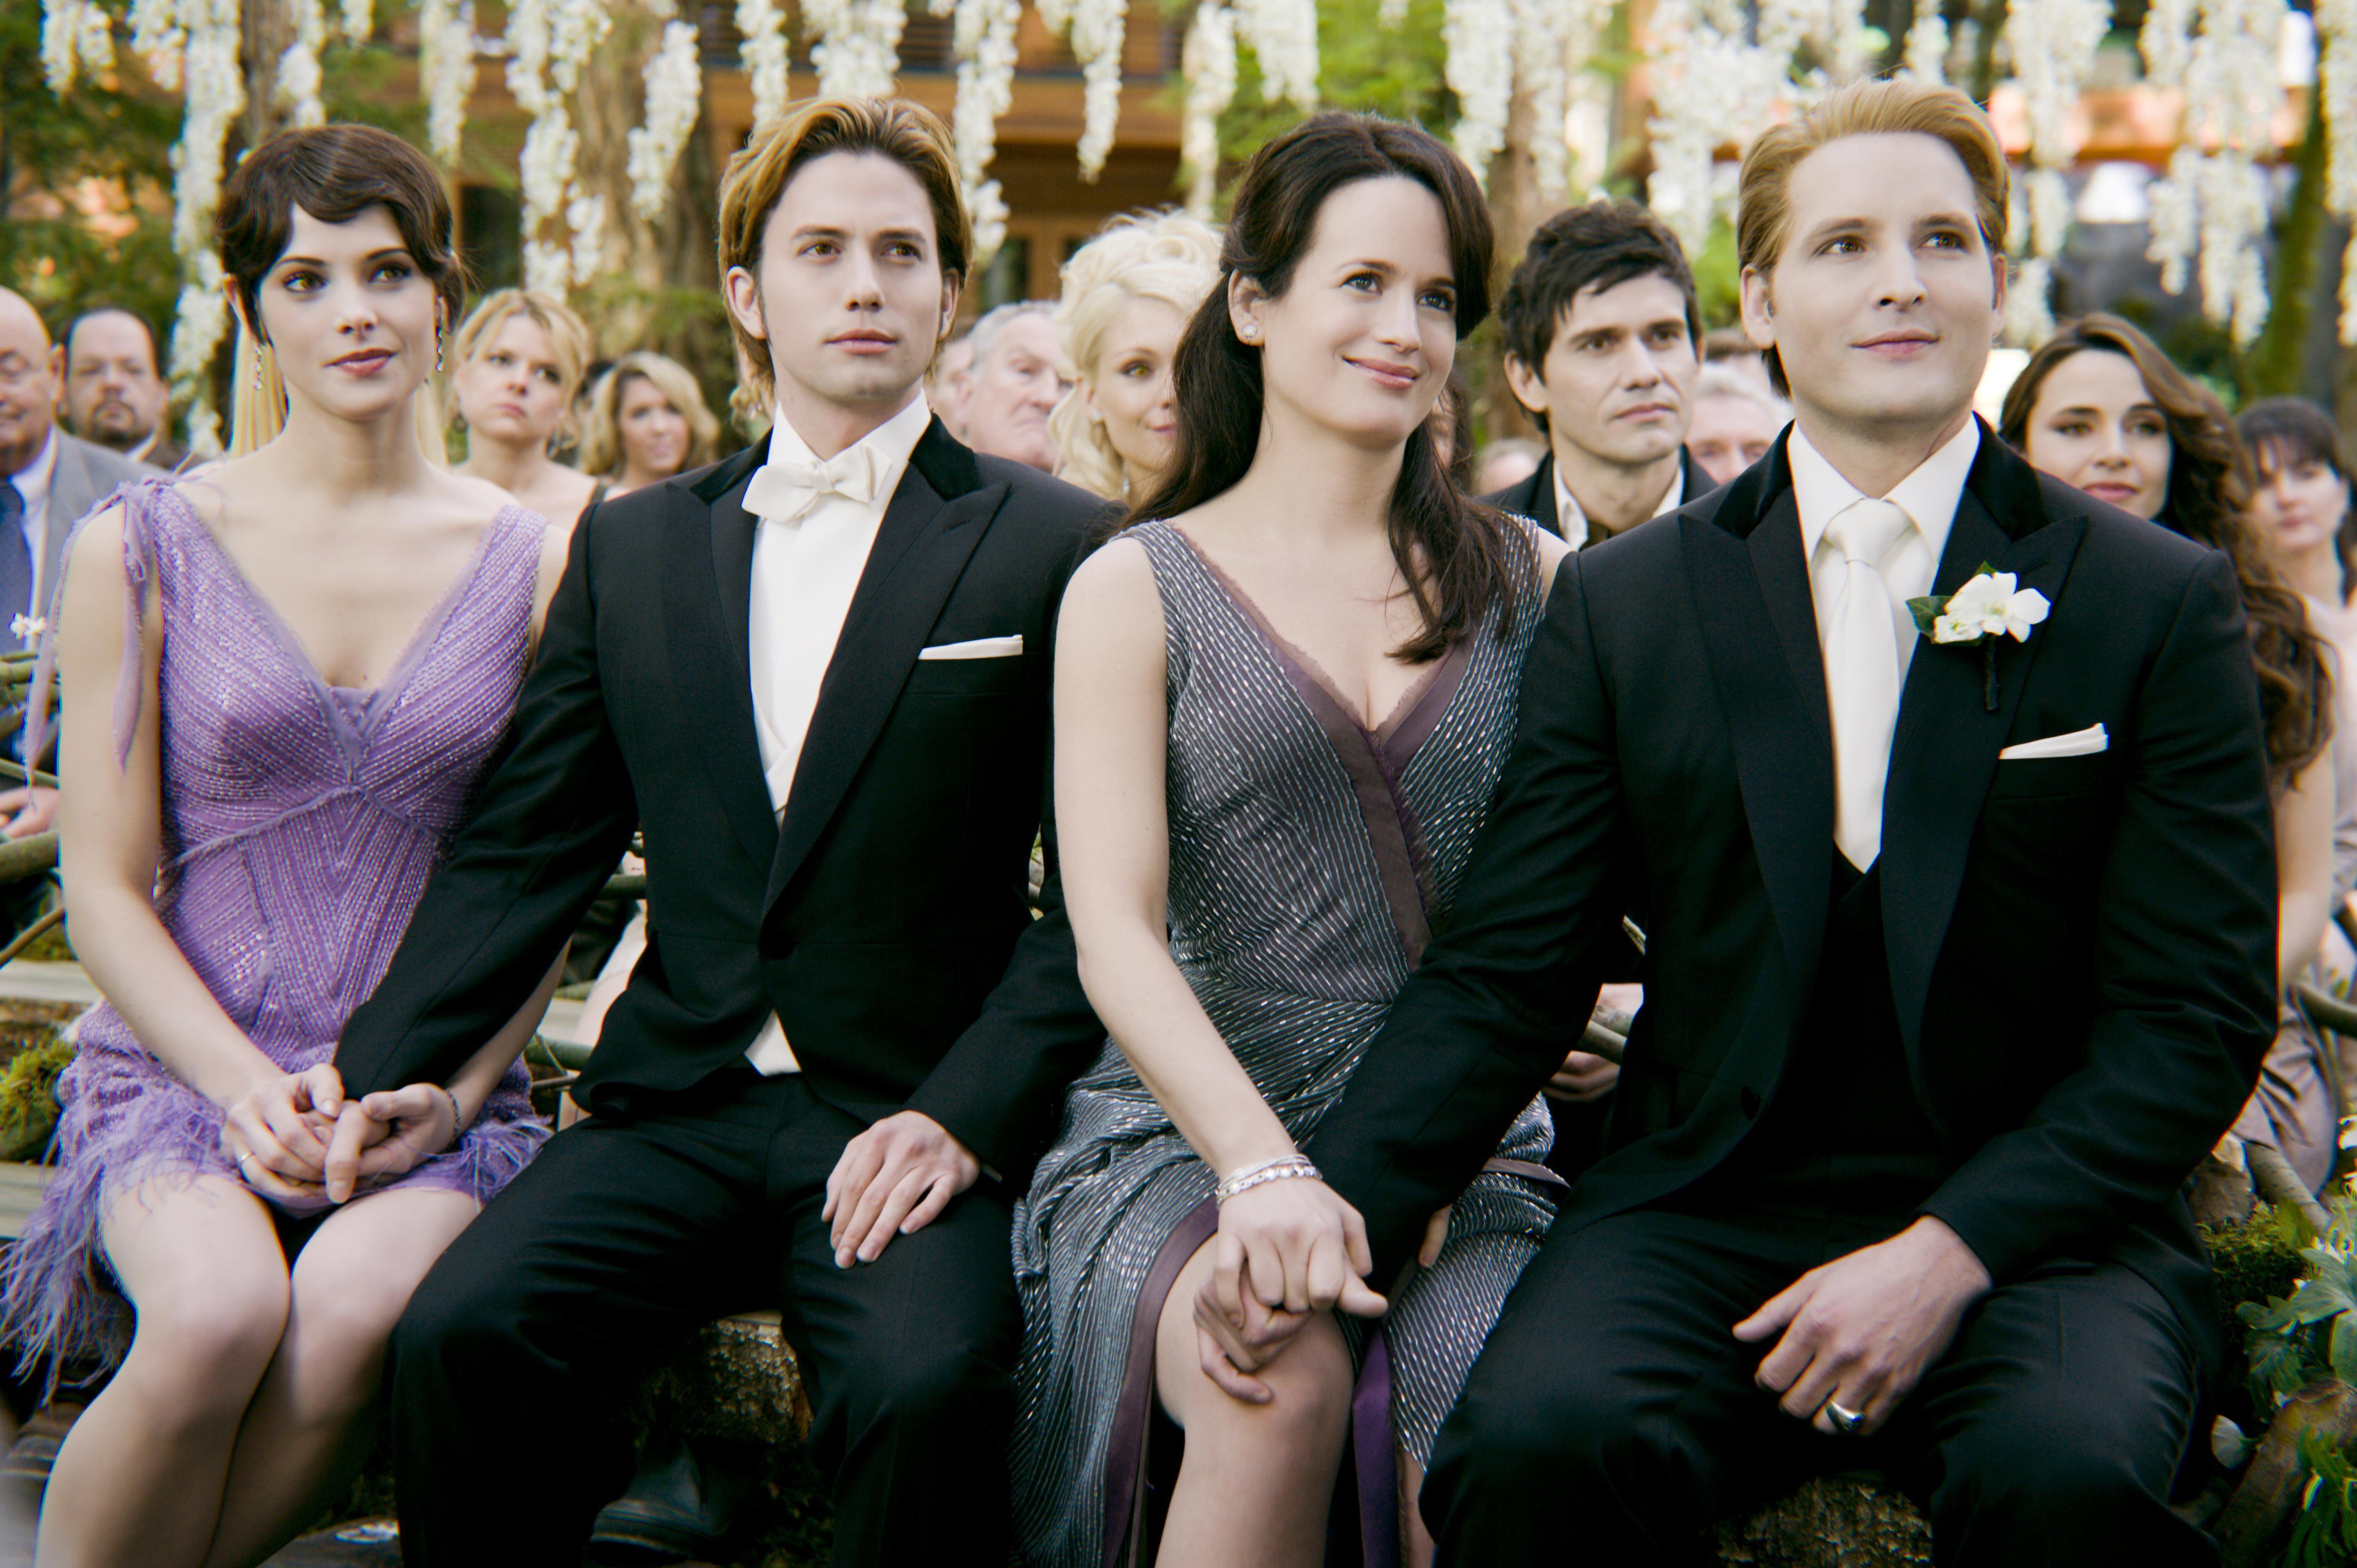 Epingle Par The Twilight Saga Uk Sur The Cullens Crepuscule Mariage Elizabeth Reaser Saga Twilight [ 3407 x 5120 Pixel ]